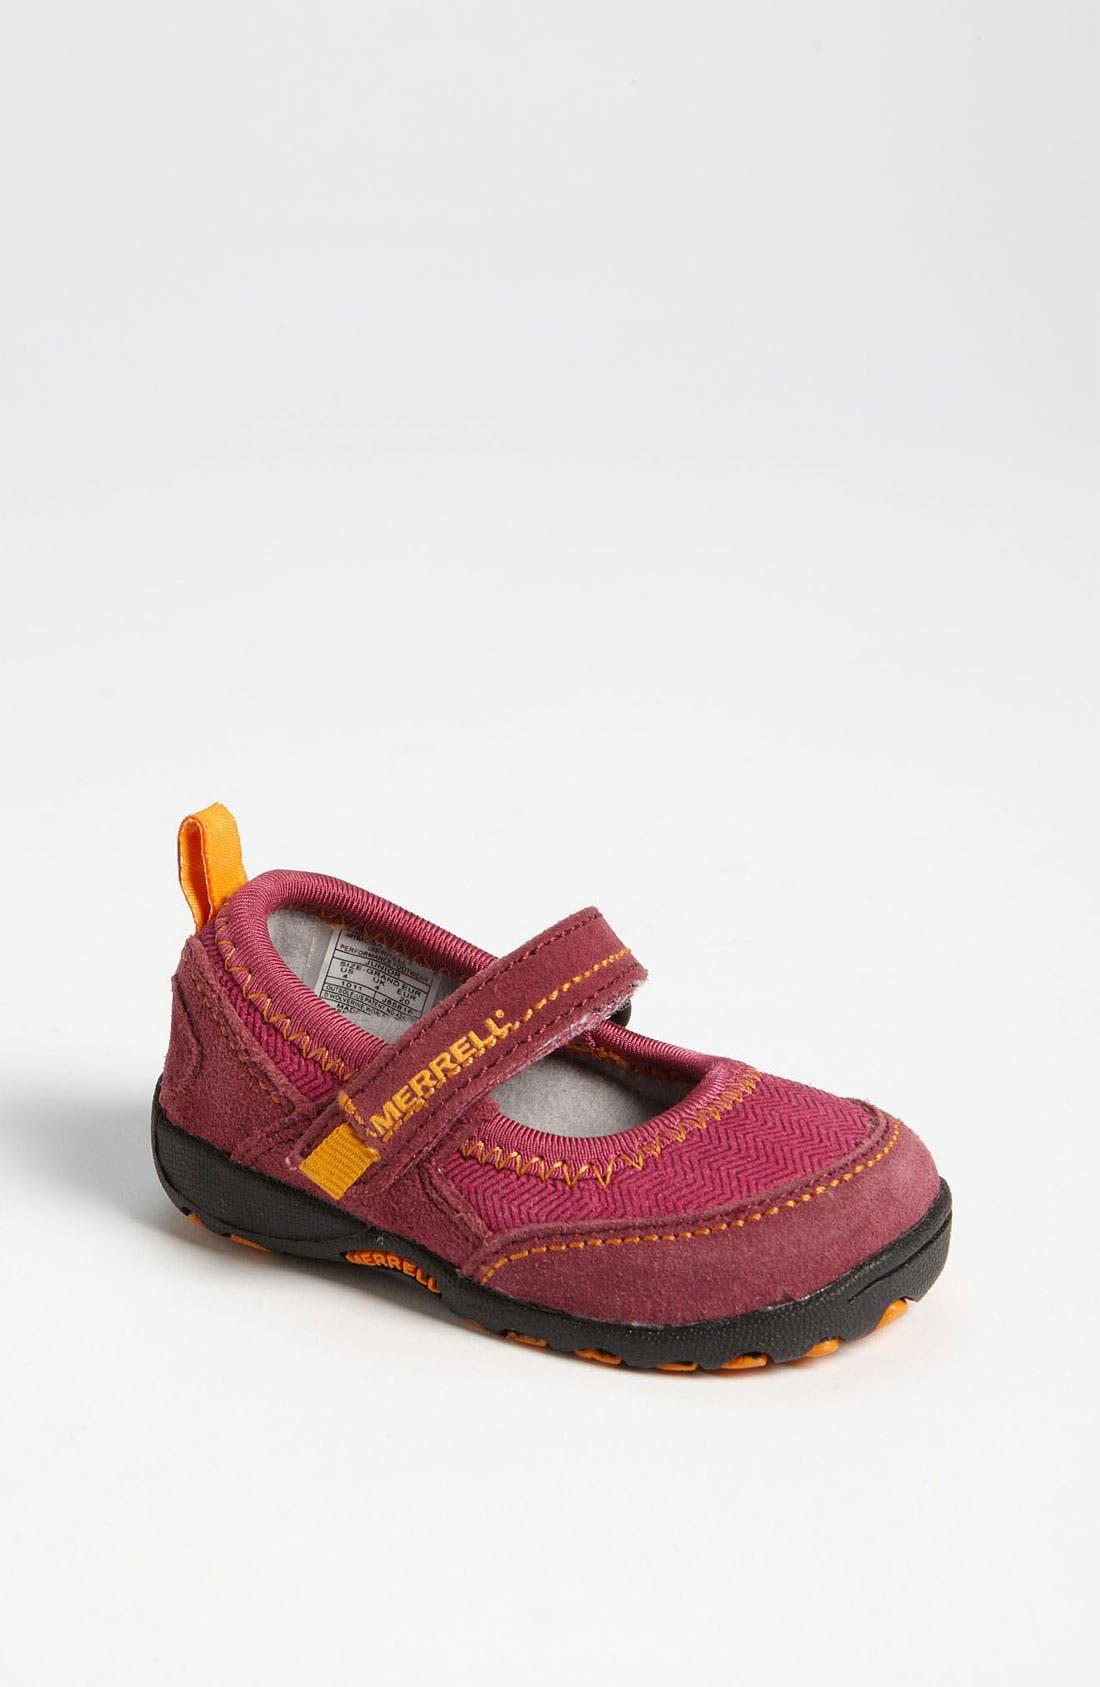 Main Image - Merrell 'Mimosa' Mary Jane Sneaker (Baby & Walker)